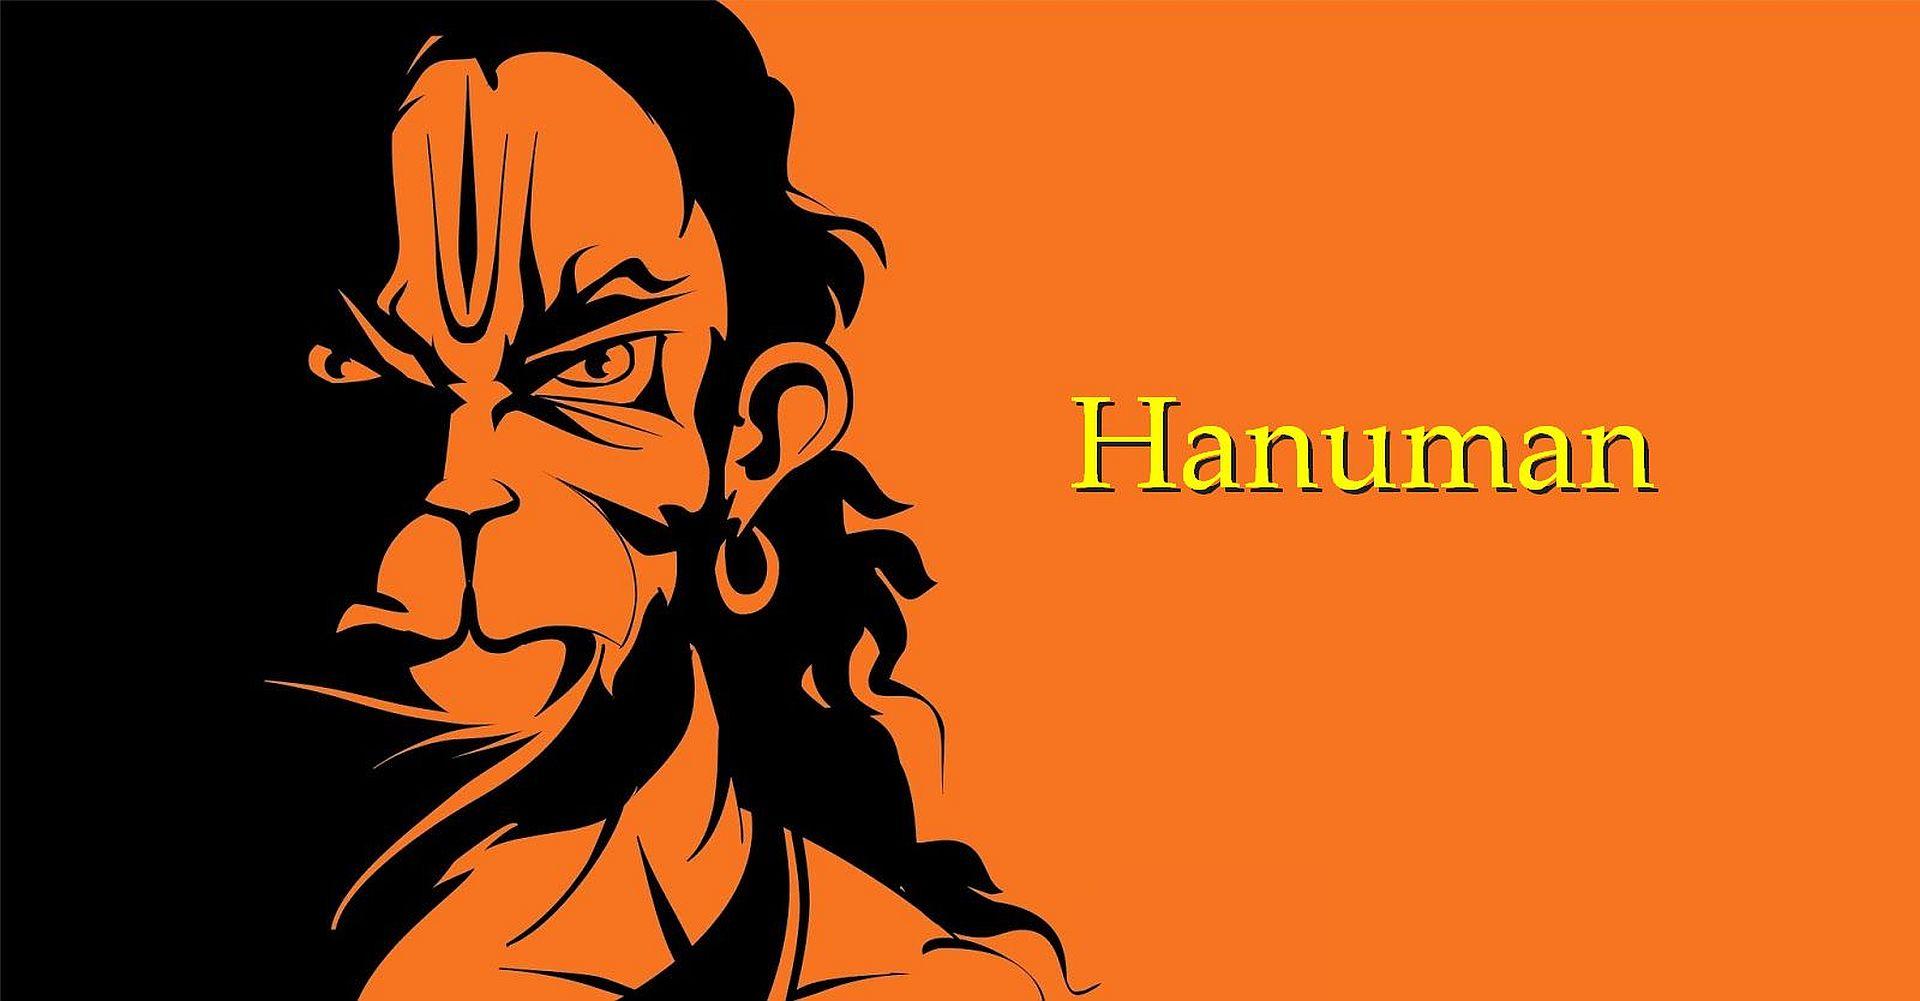 hanuman hd wallpapers 1080p god hd wallpapers